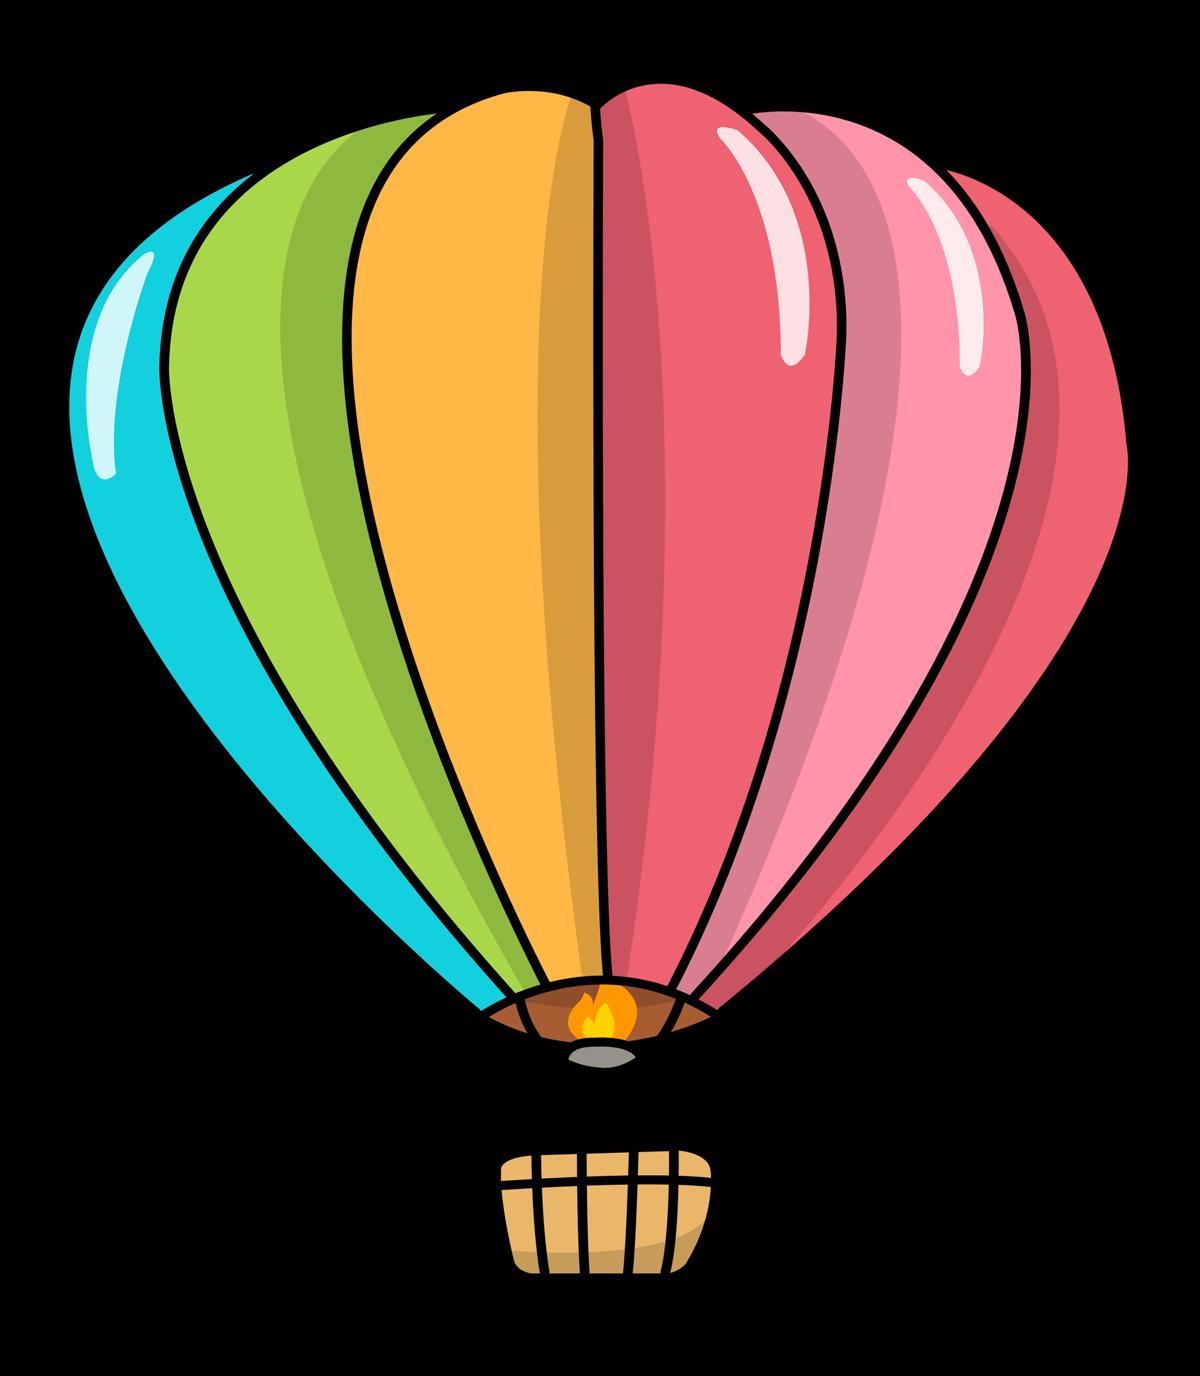 Hot air clip art. Clipart balloon outline